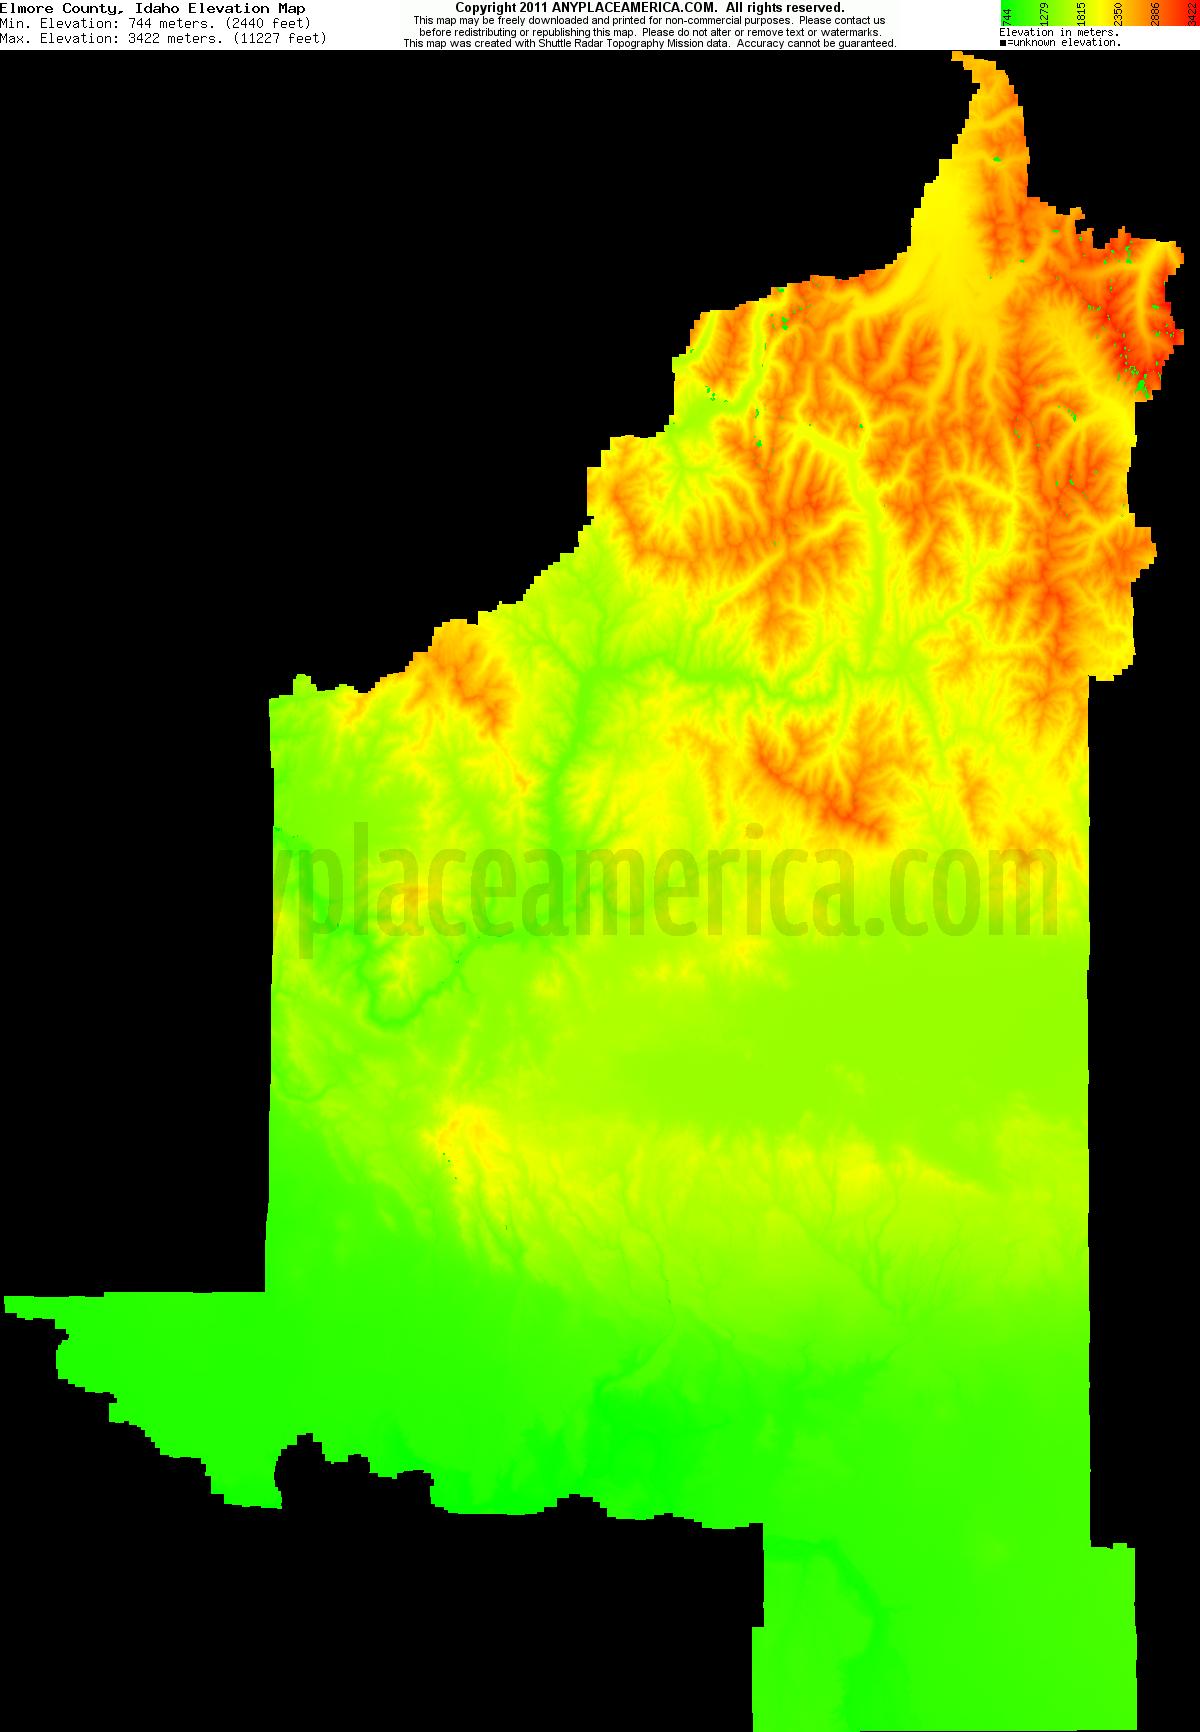 Free Elmore County, Idaho Topo Maps & Elevations